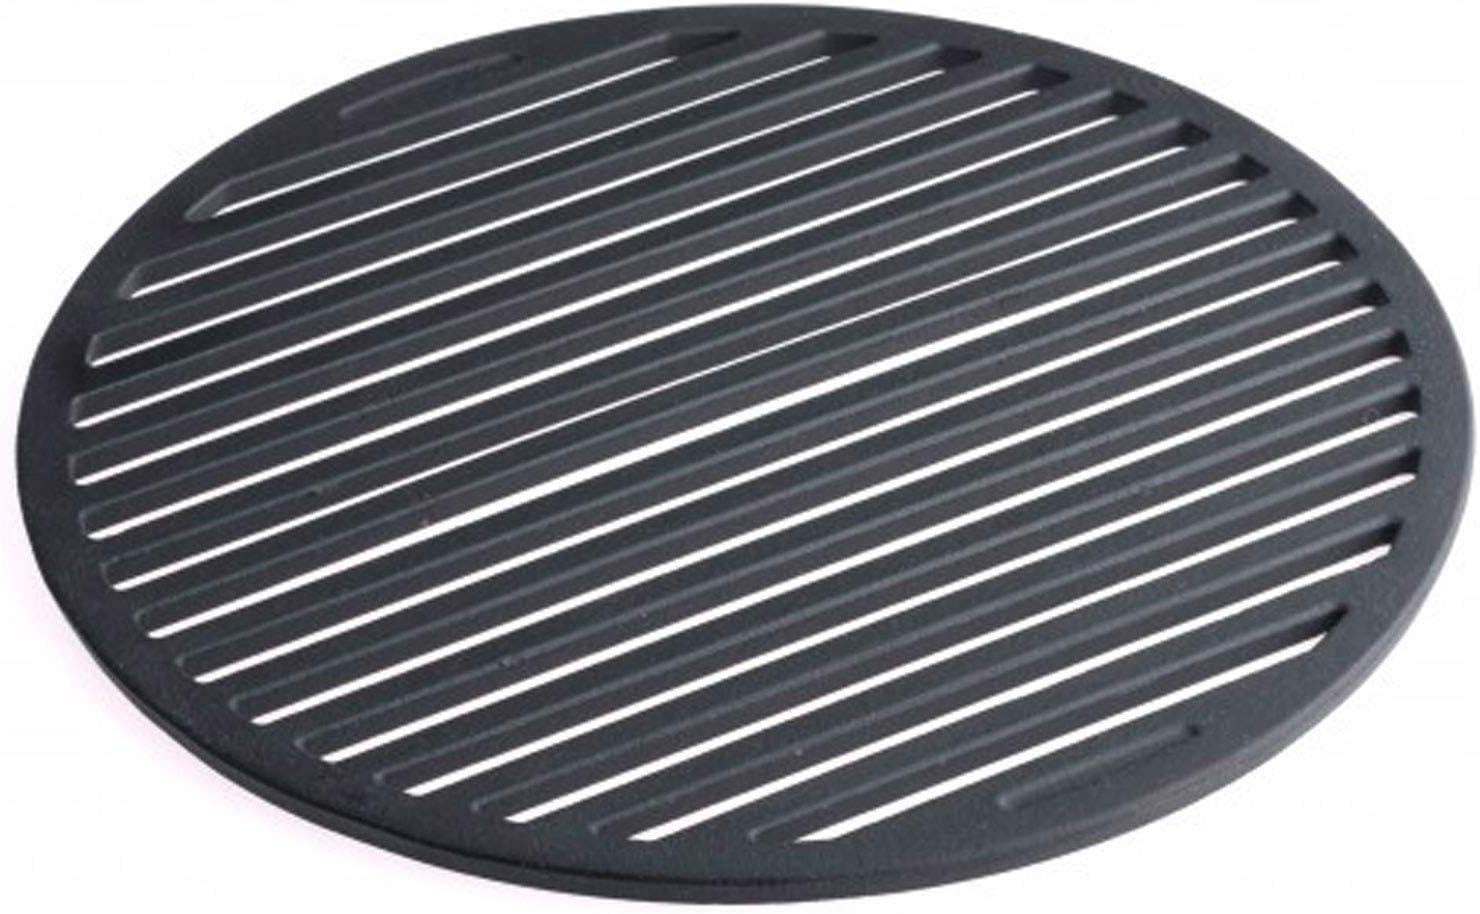 Tepro–Parrilla, Parrilla de baldas para Principal Fundido 57cm diámetro 8568, Negro, 30,5x 30,5x 1cm, 8571